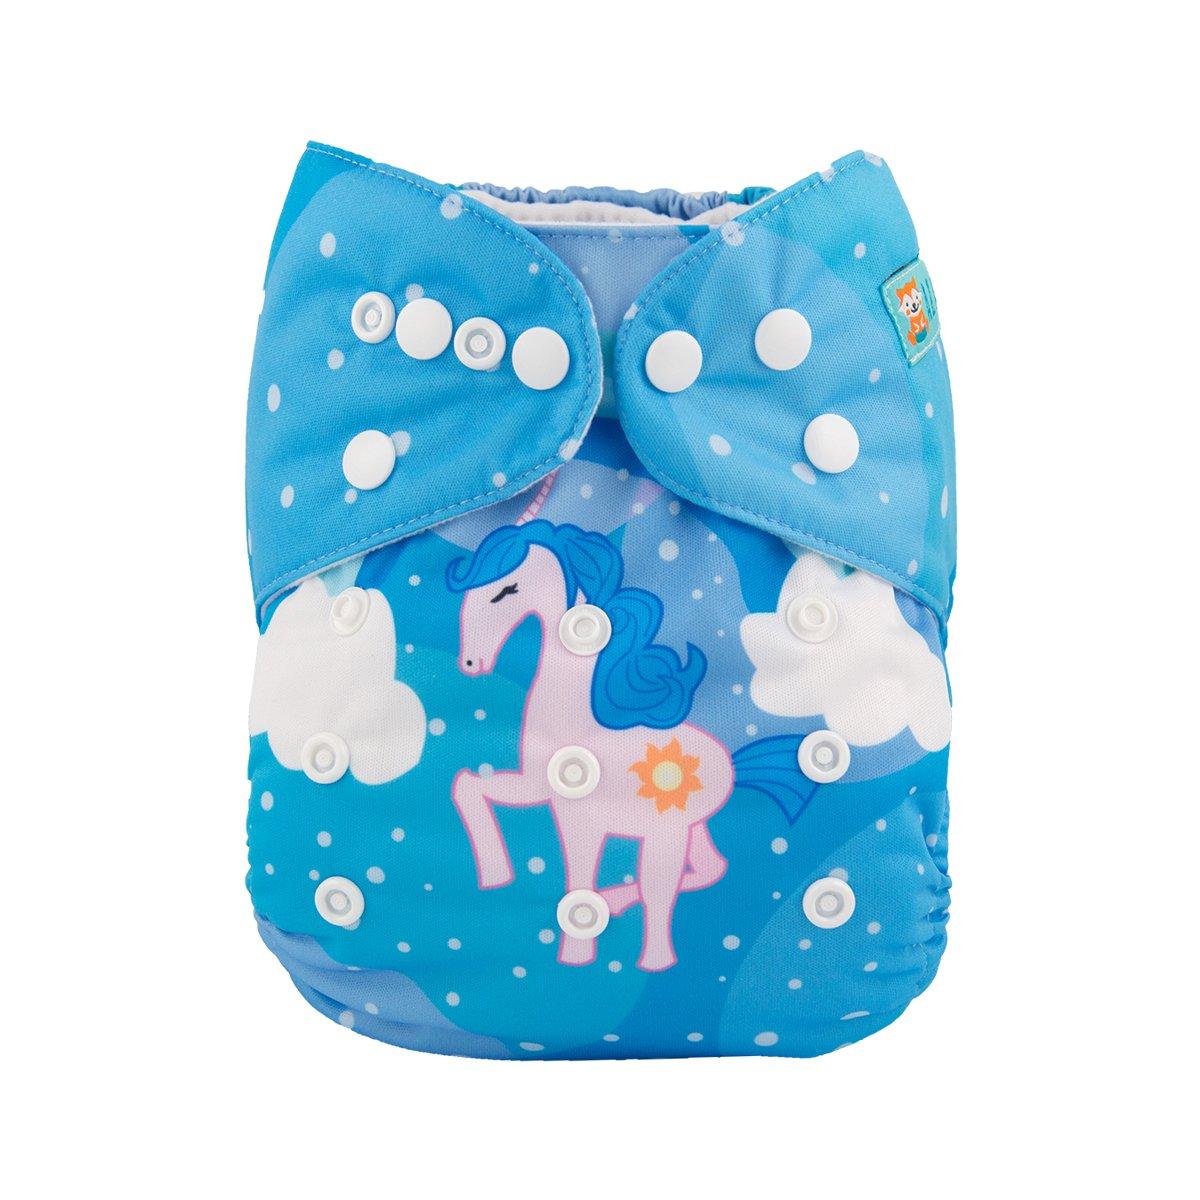 Amazon.com : ALVABABY Cloth Diaper One Size Adjustable Reuseable ...